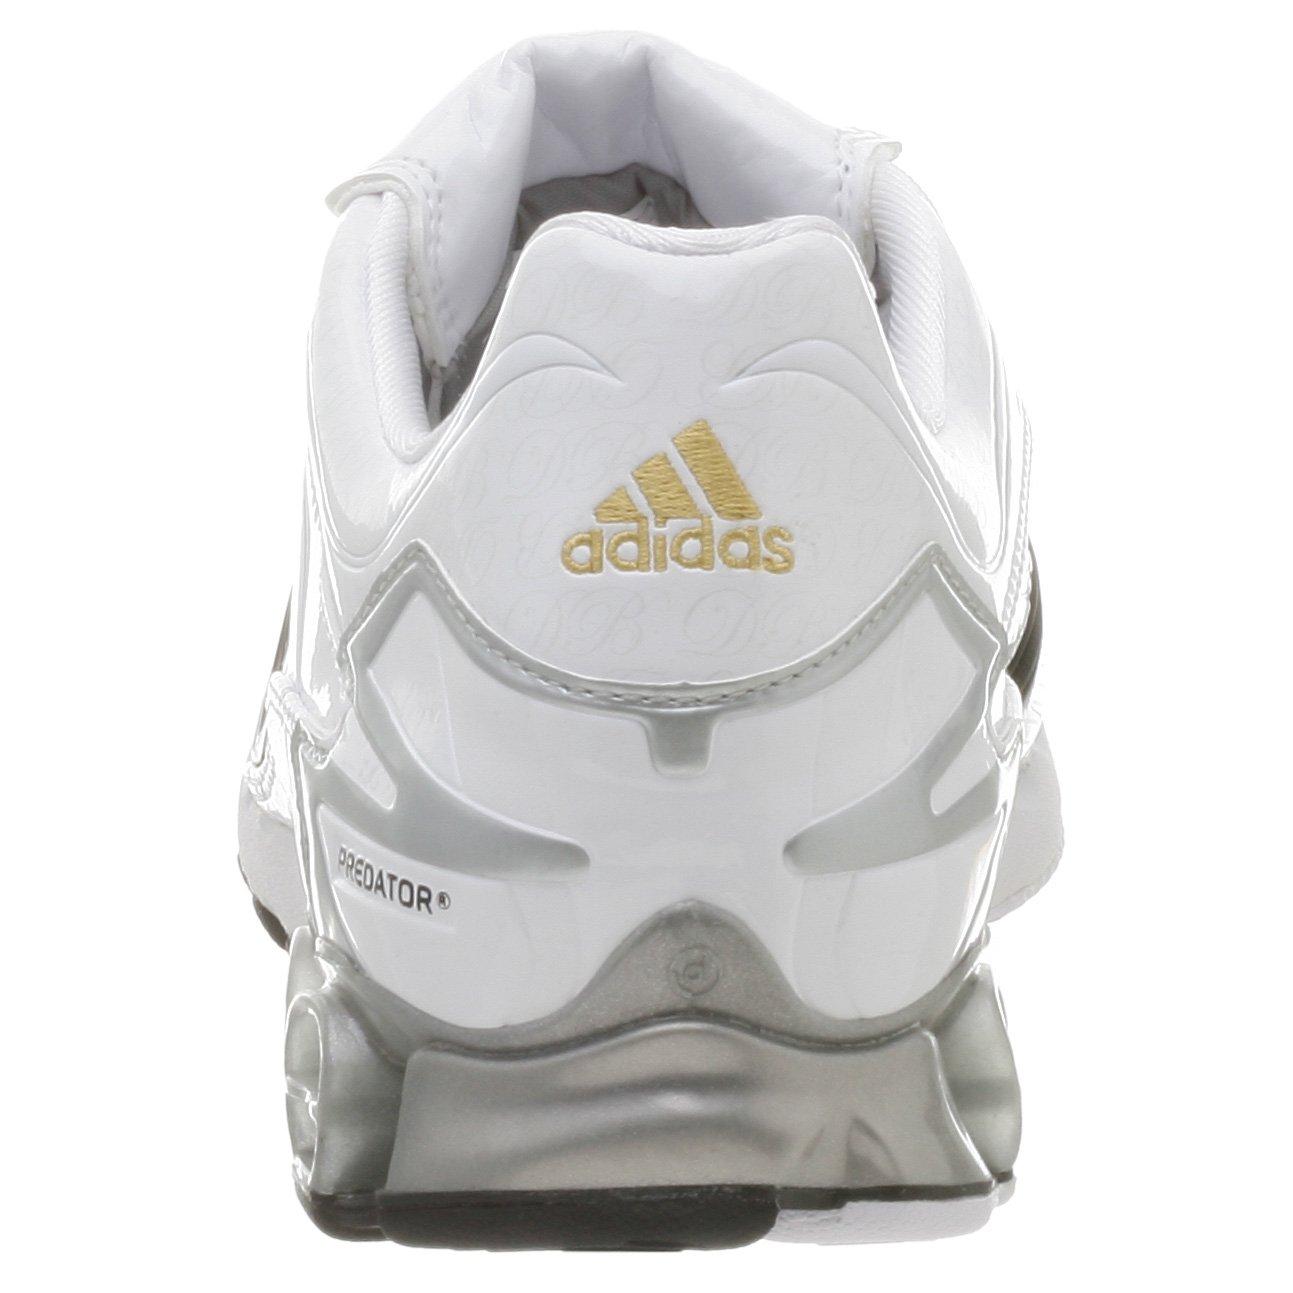 a72a4901aea adidas Men s a CUB +Predator Absolute David Beckham Soccer Shoe